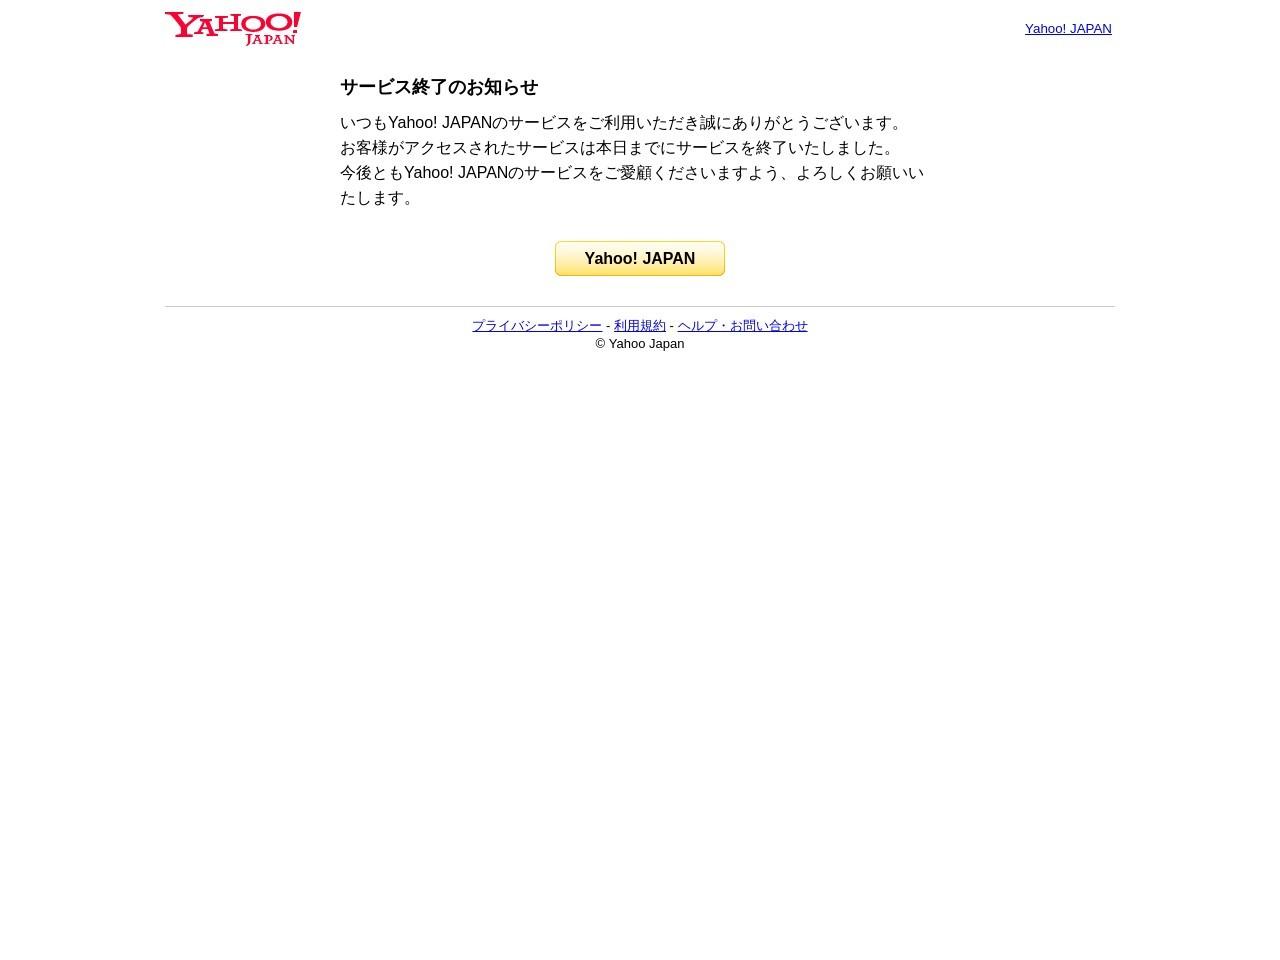 http://www.geocities.jp/mikasakkk9999jp/